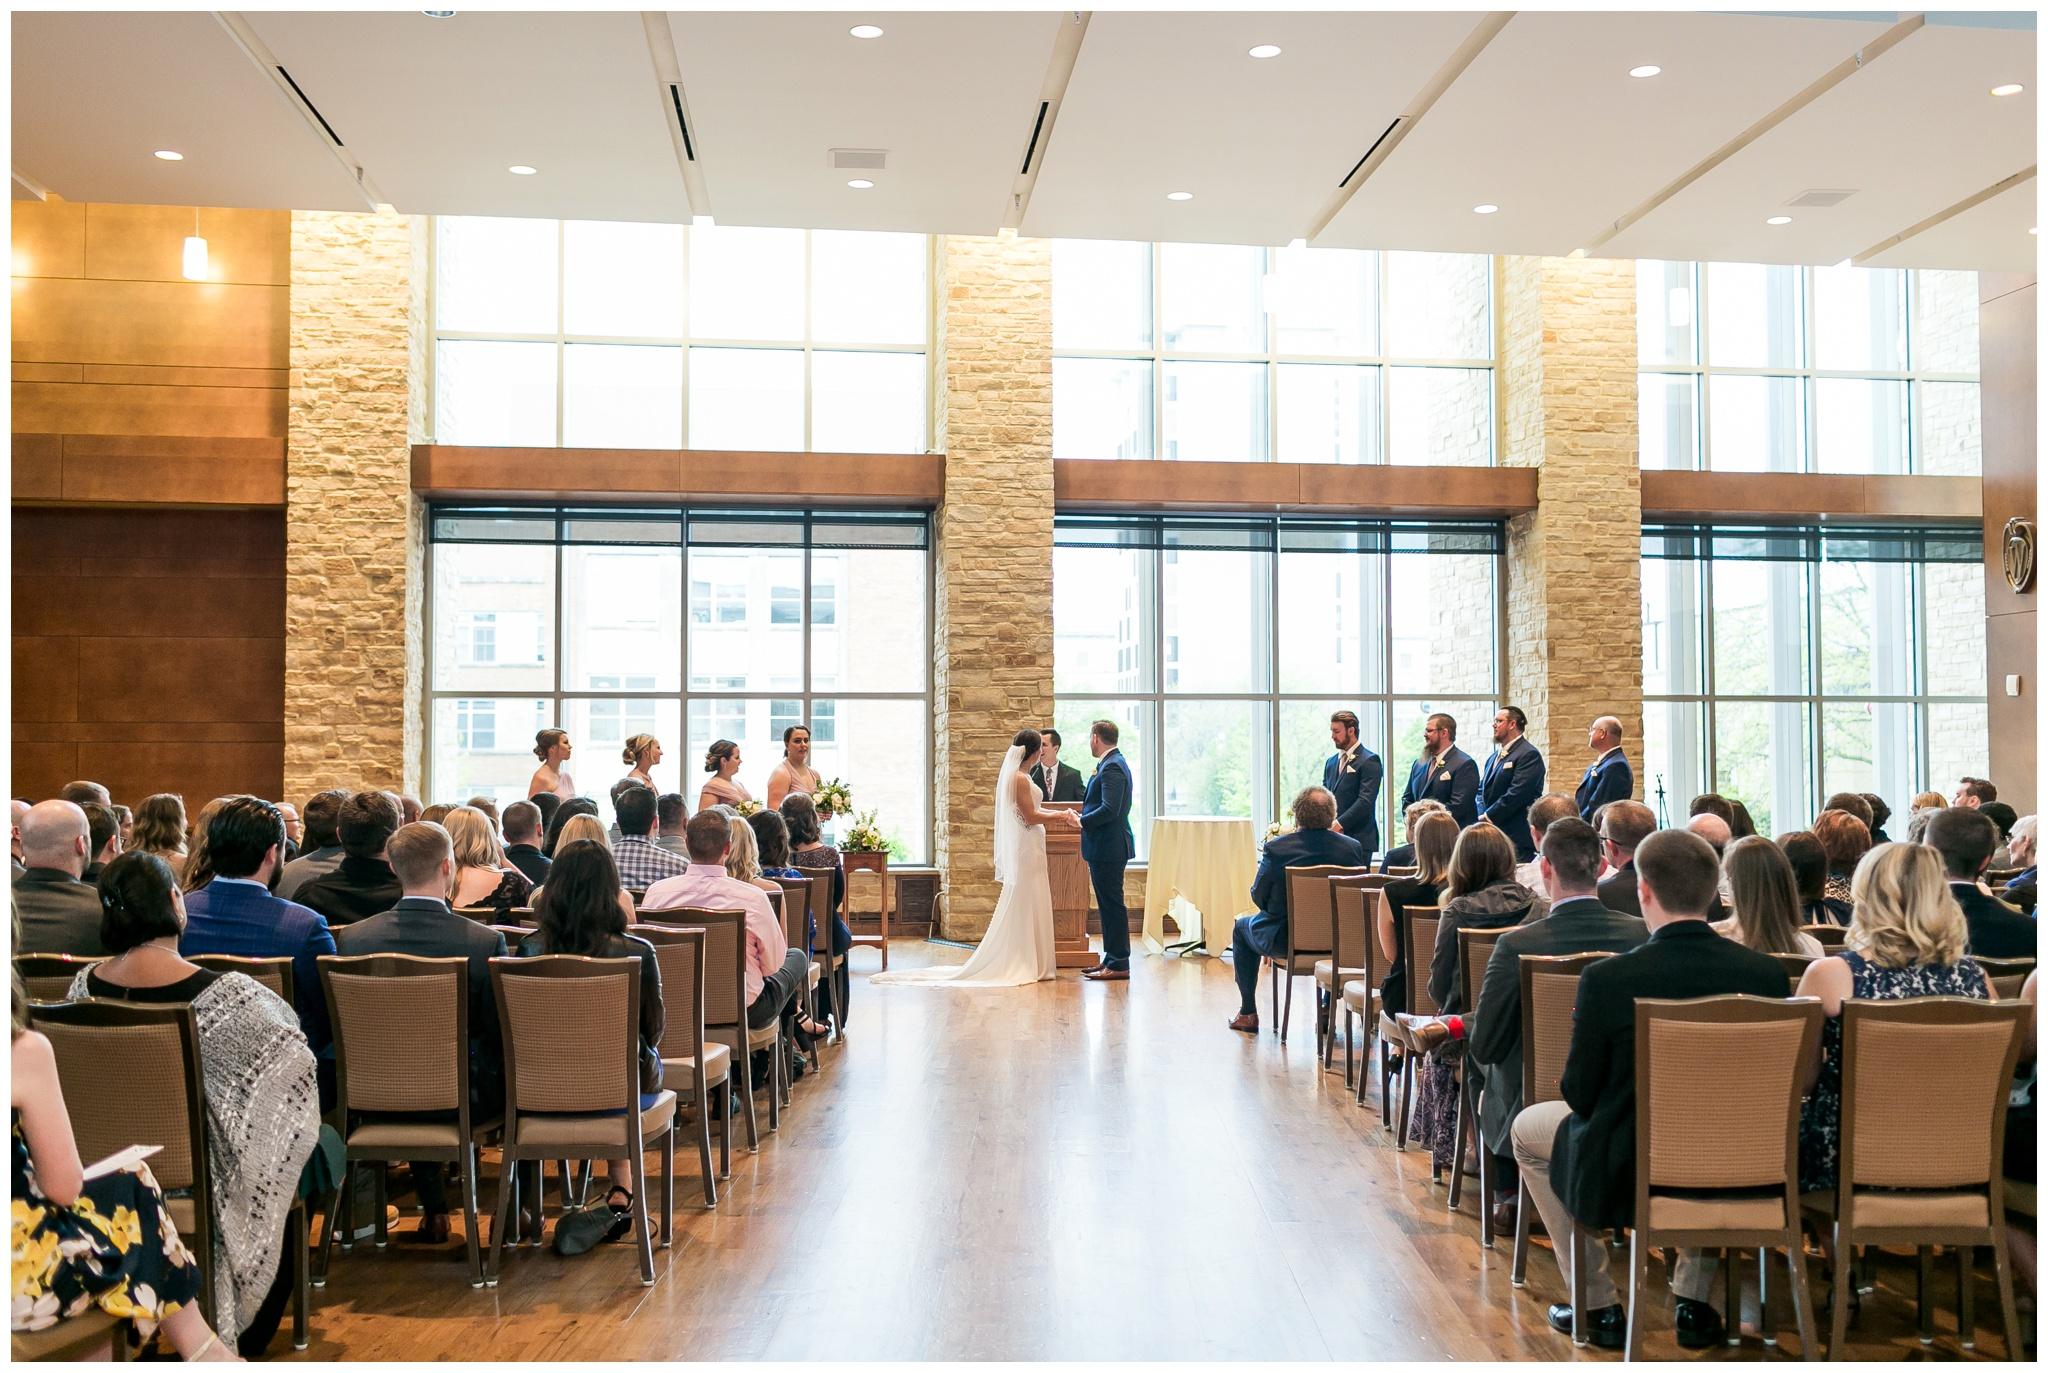 Union_south_Wedding_Madison_Wisconsin_Caynay_Photo_3675.jpg